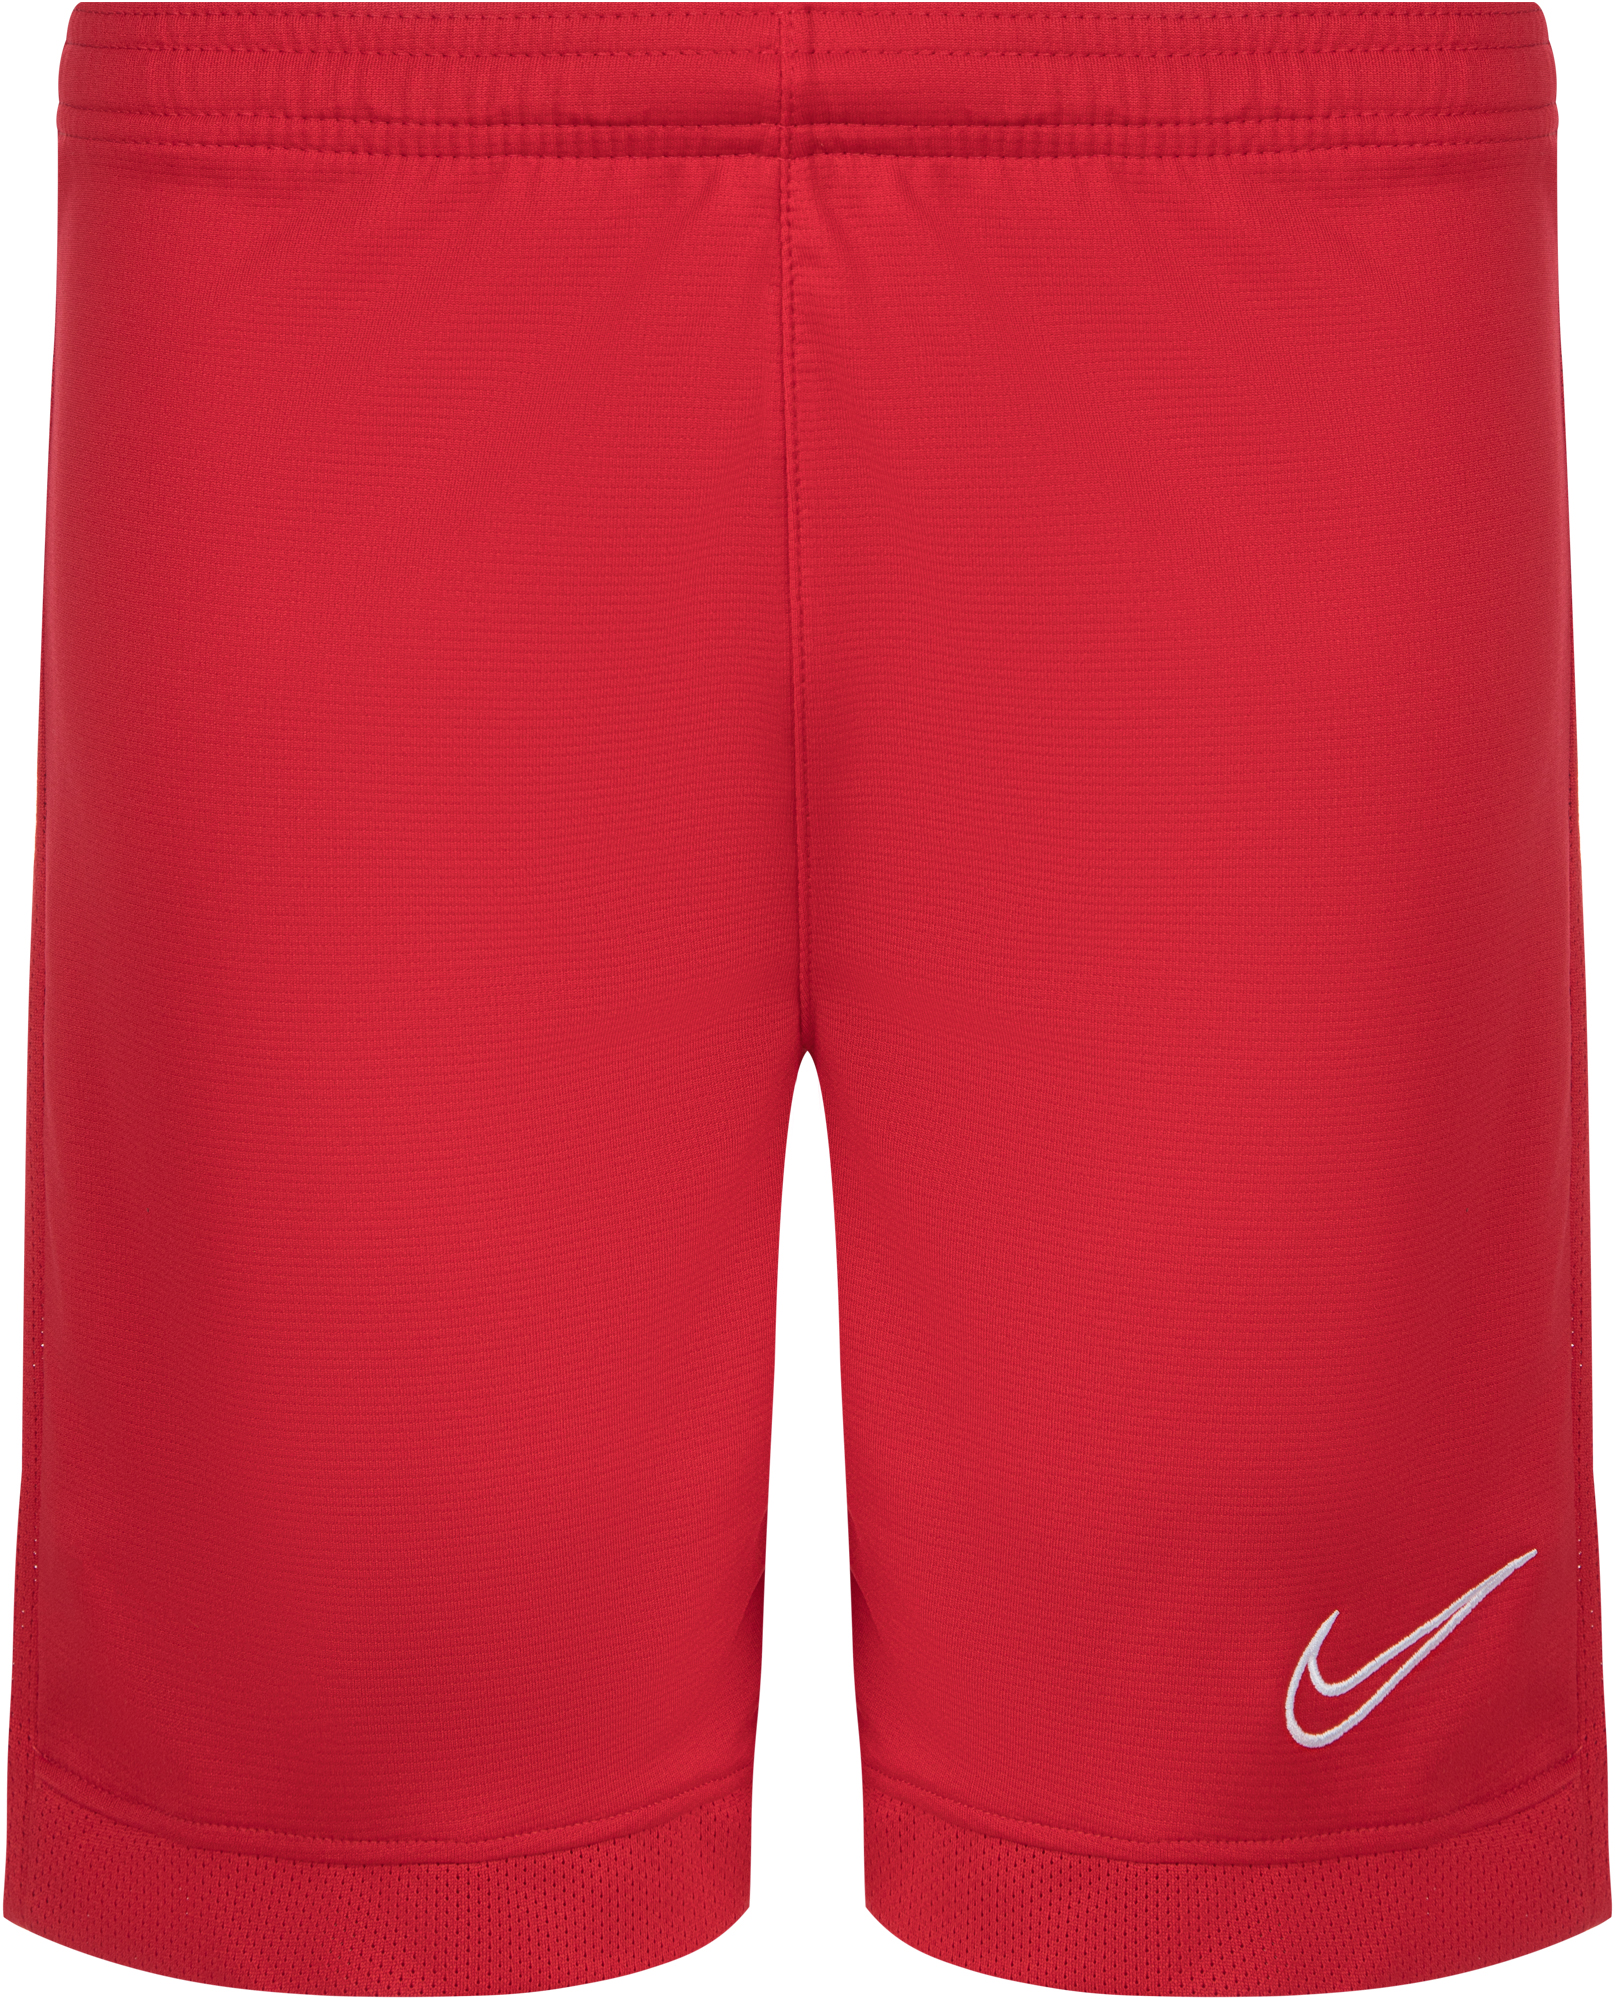 Nike Шорты для мальчиков Dry Academy, размер 158-170